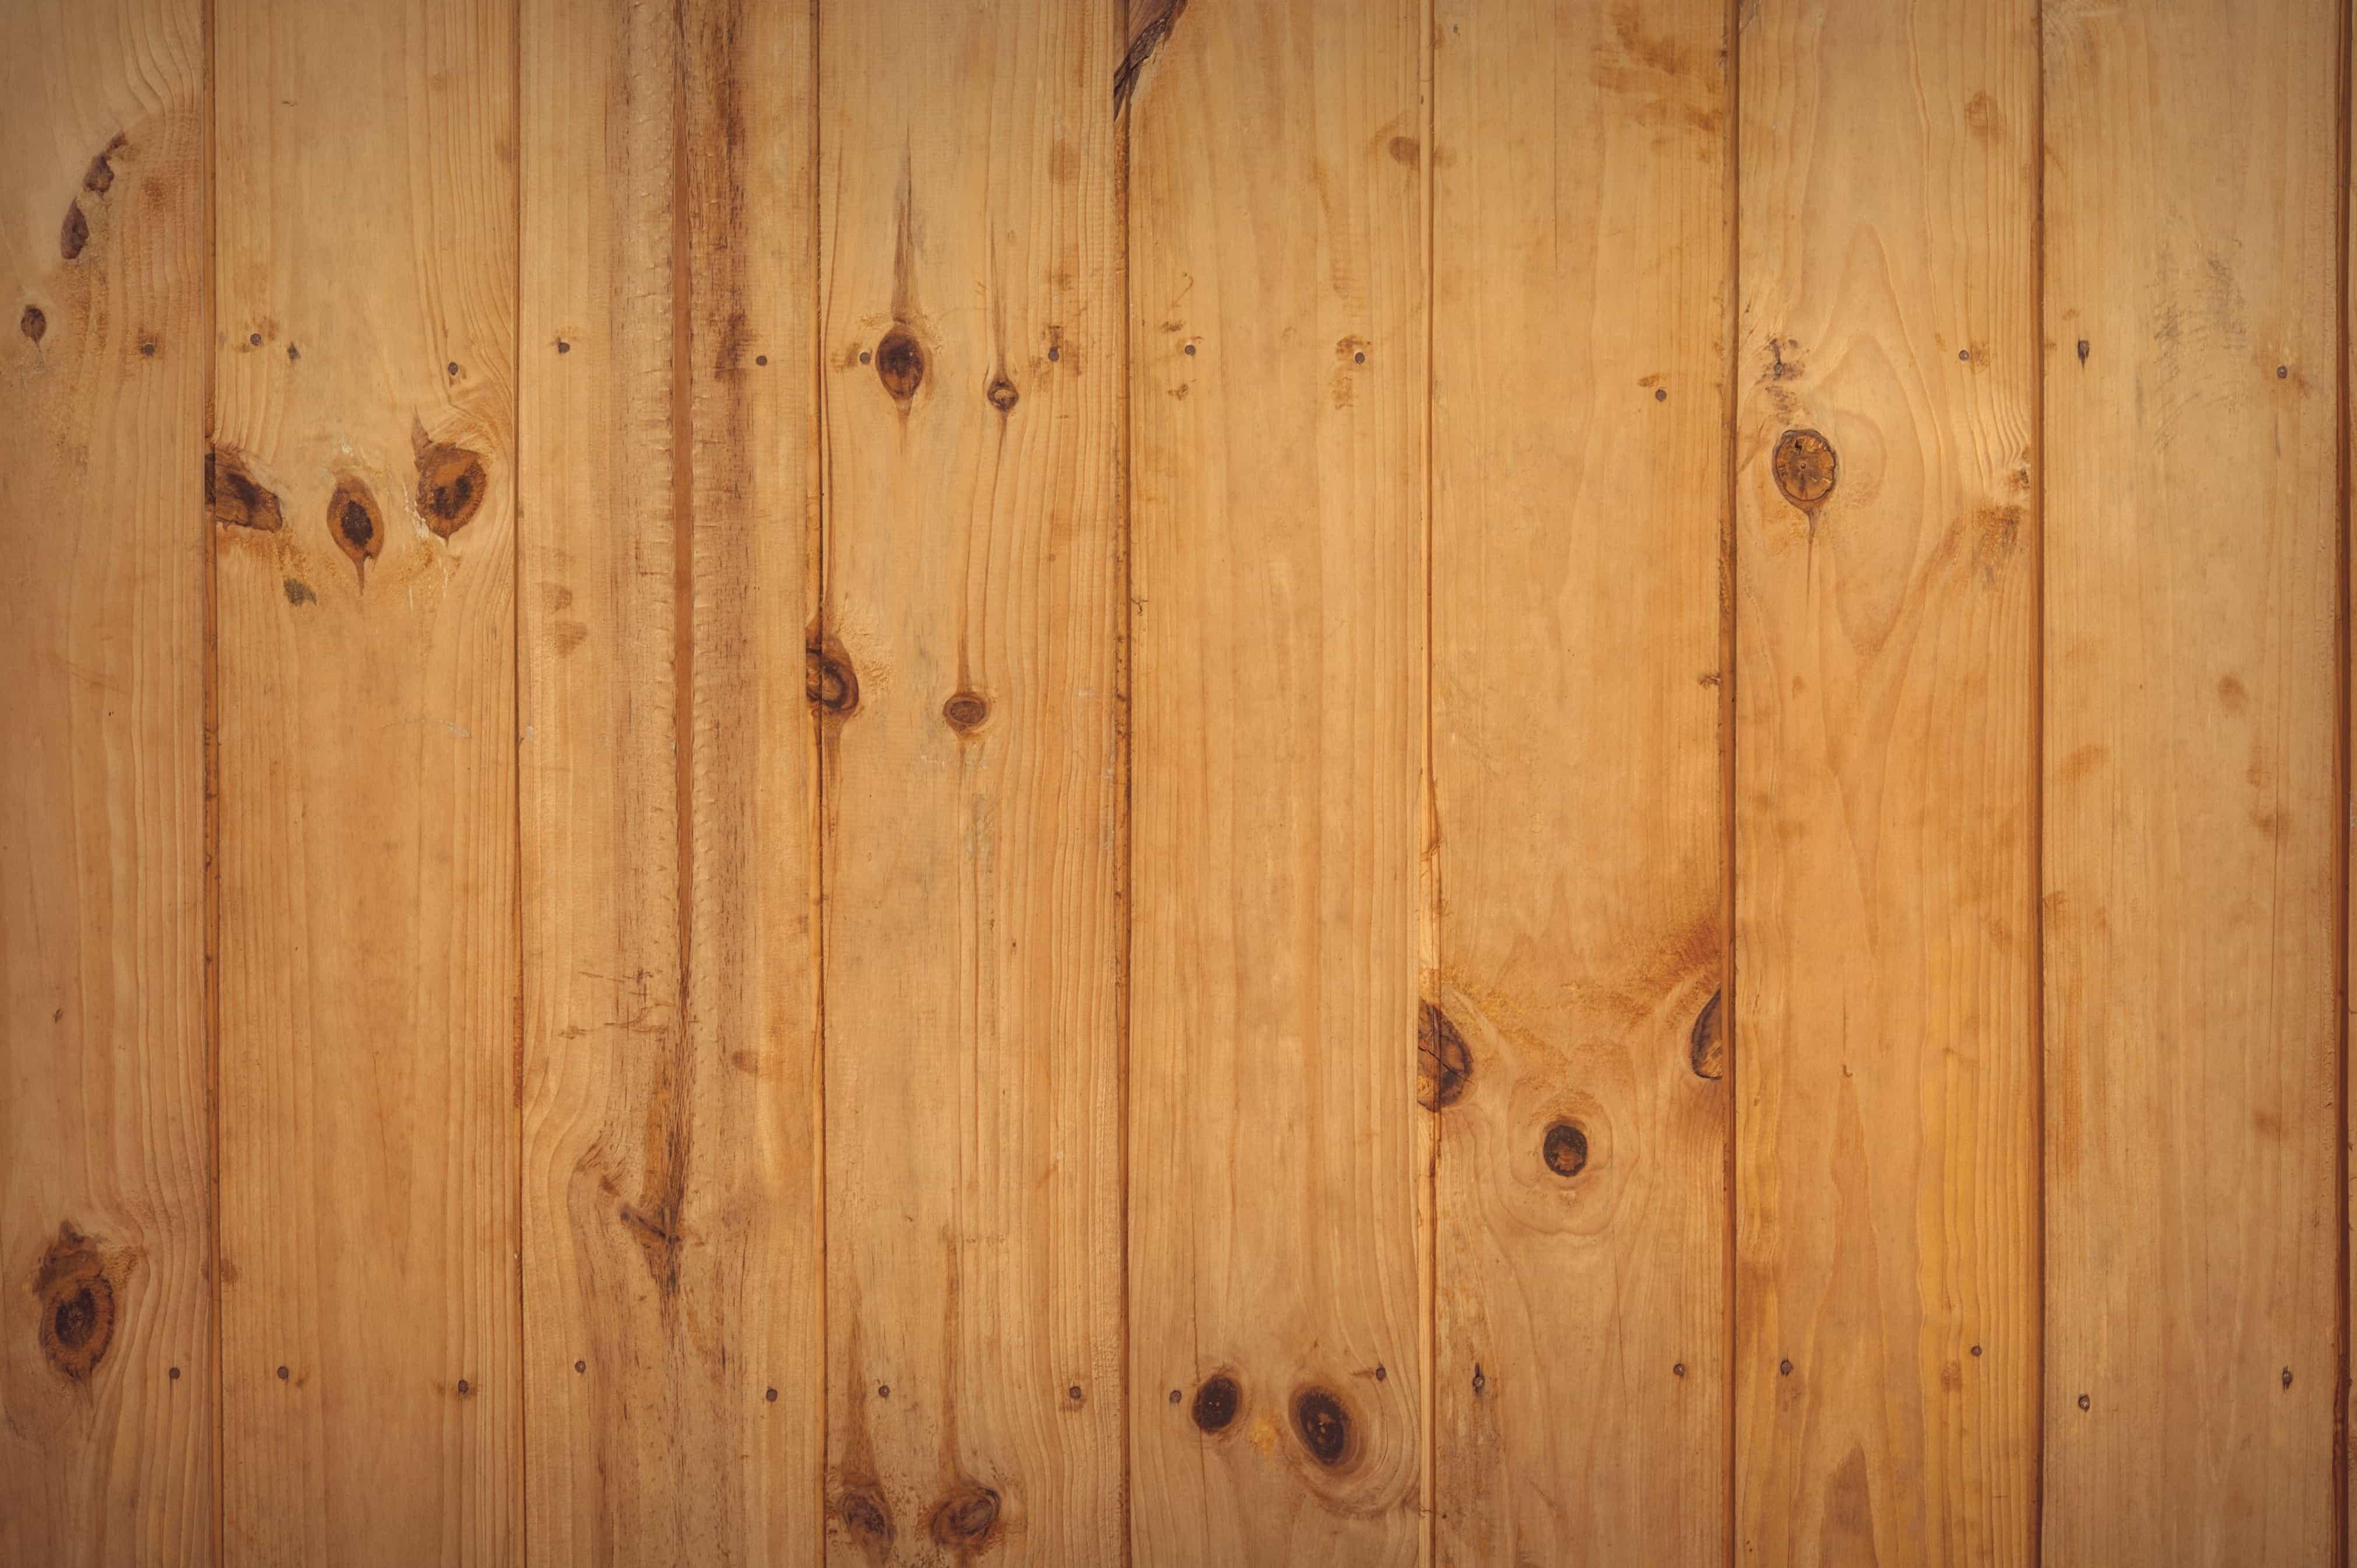 kostenlose bild: holz, zimmerei, rauh, hartholz, boden, holz, oberfläche